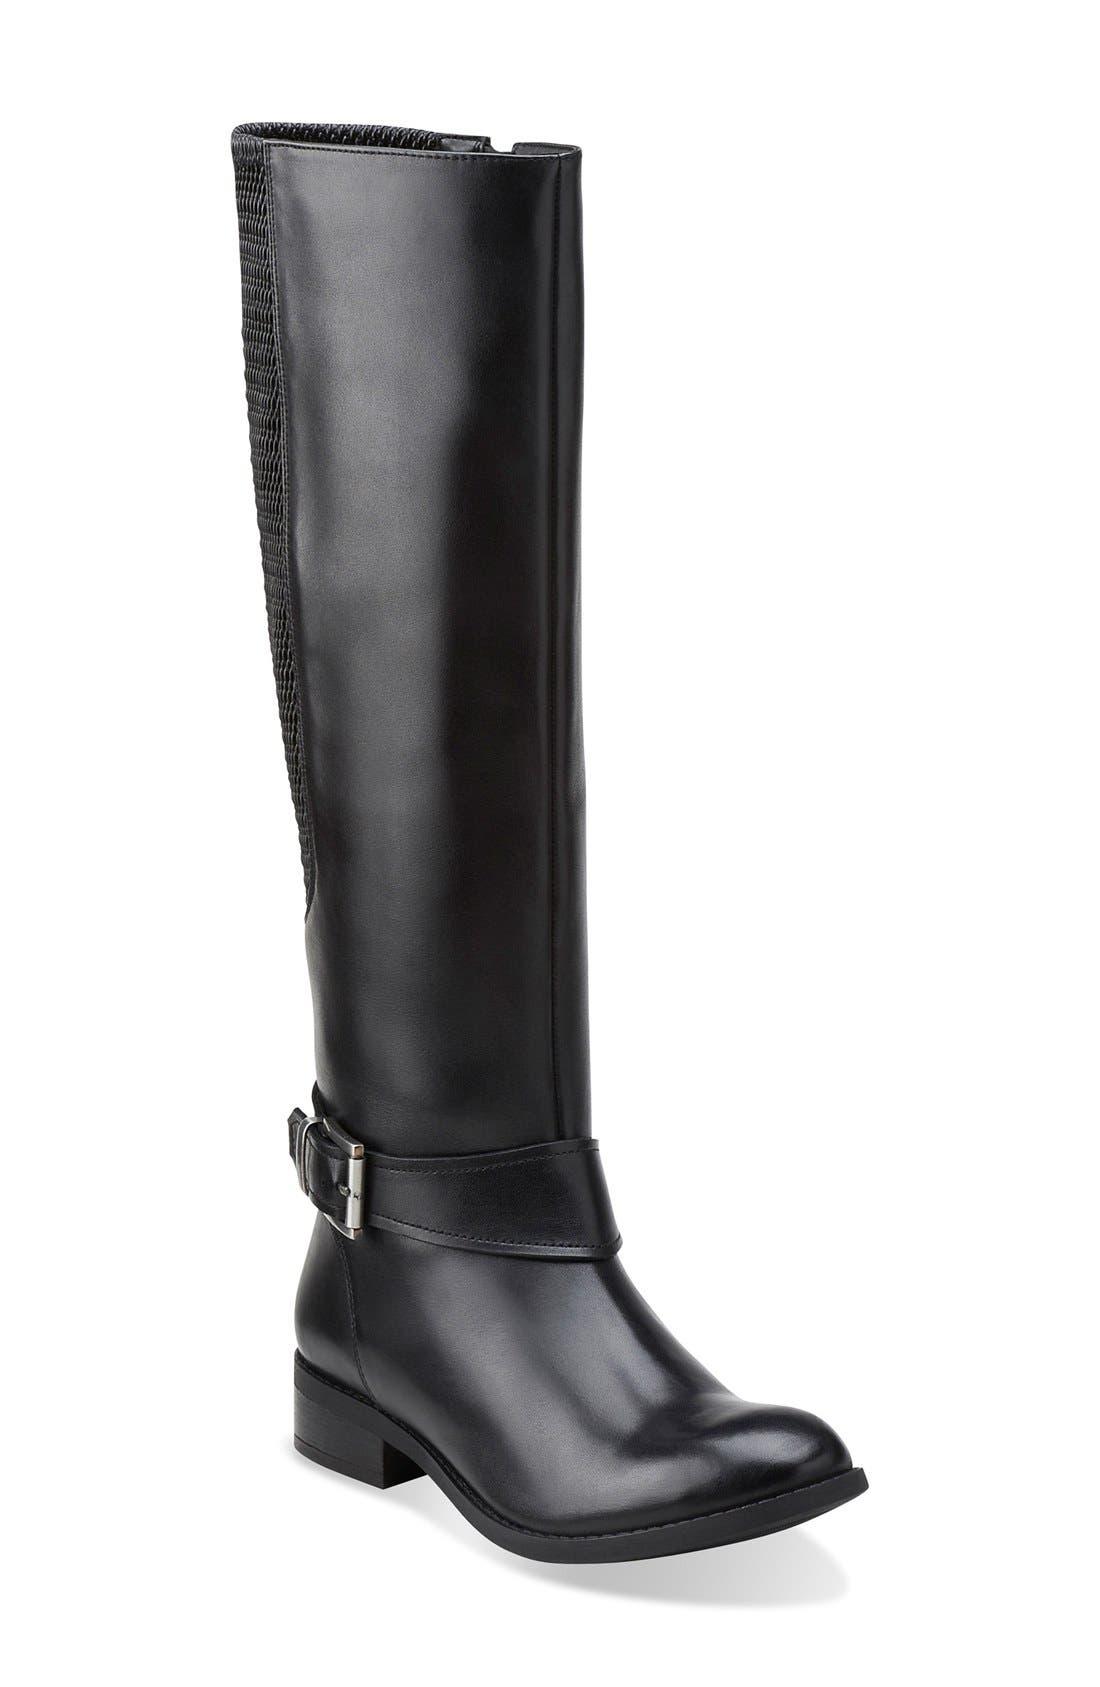 CLARKS<SUP>®</SUP> 'Pita Dakota' Tall Boot, Main, color, 003